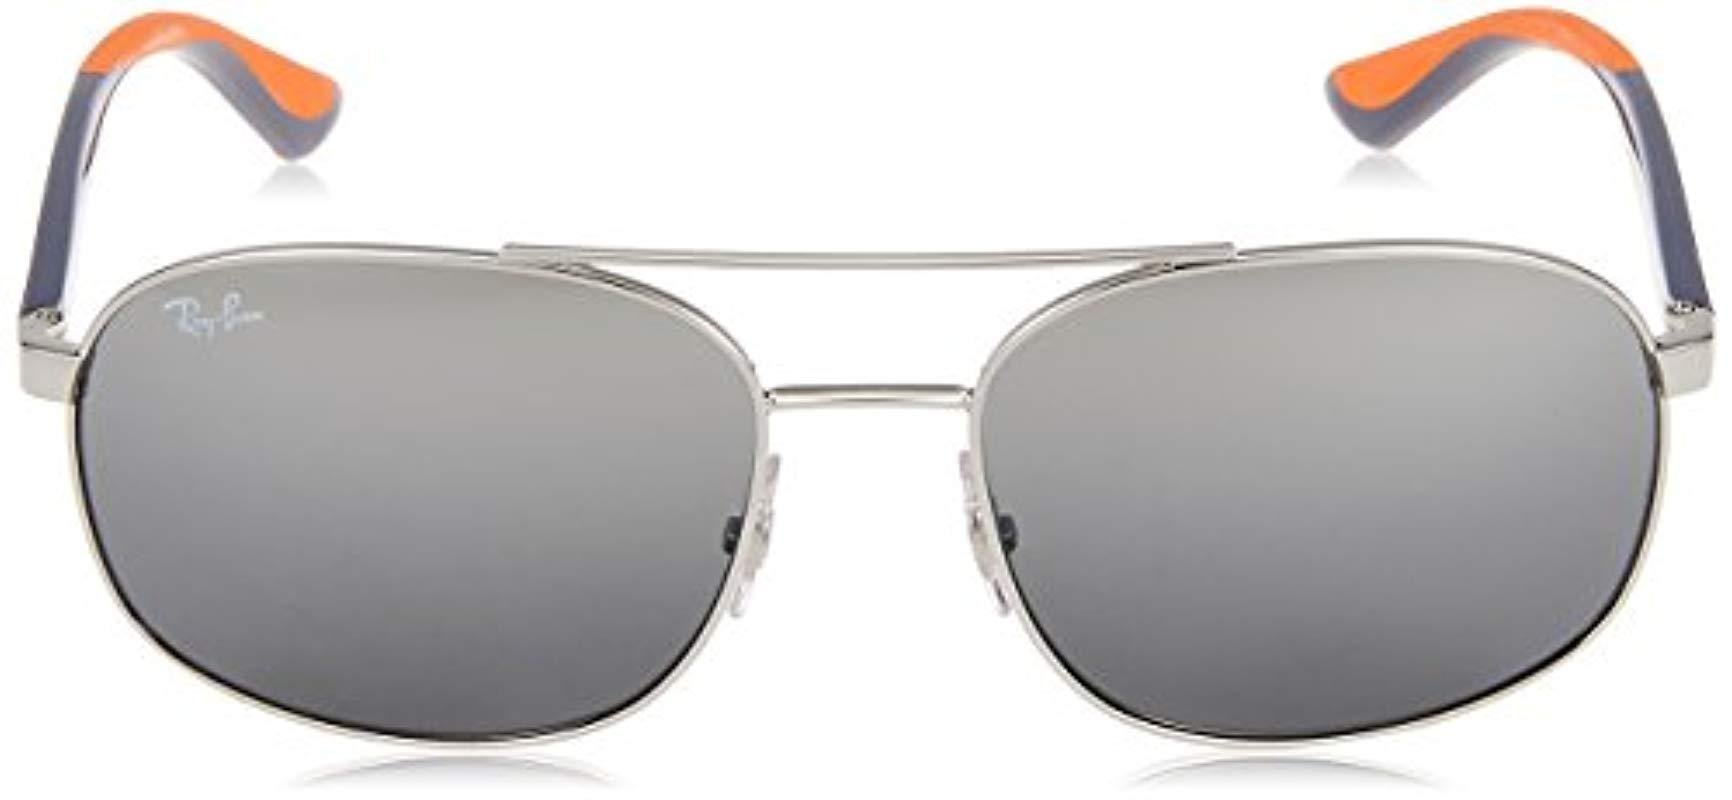 0rb3593 910188 58 Gafas de sol, Silver, Hombre Ray Ban de